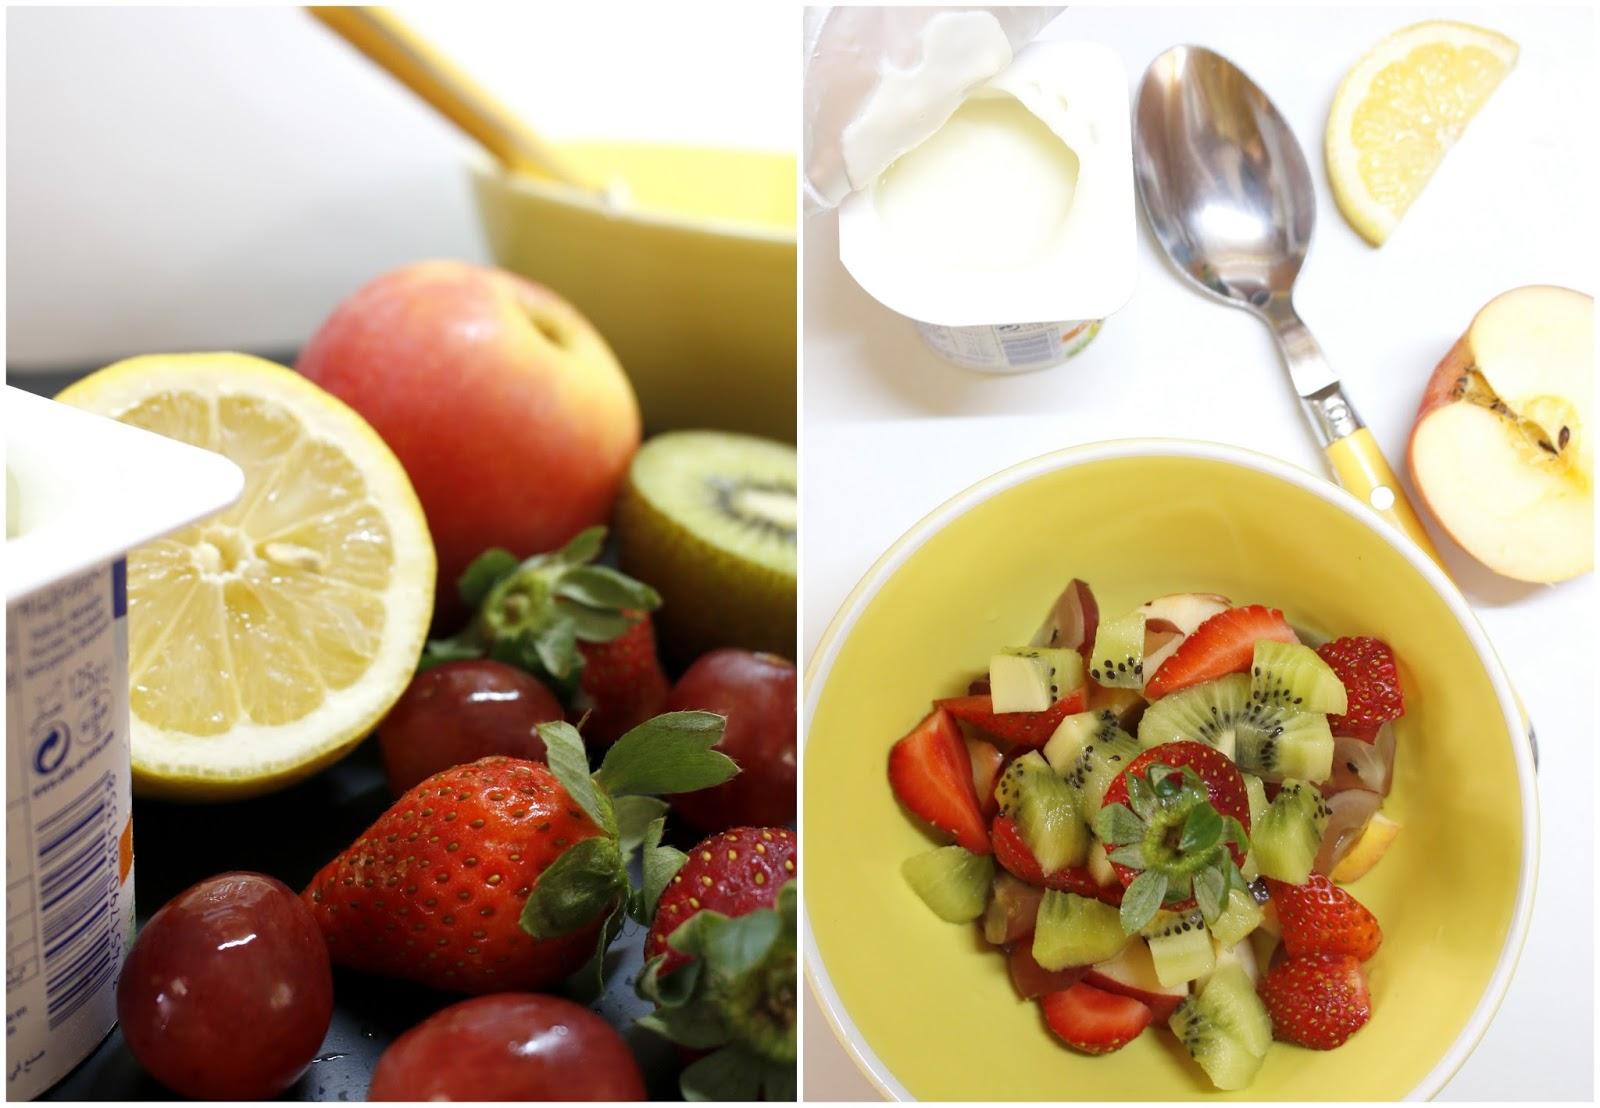 Ini Dia 8 Buah Untuk Diet Pengganti Makan Malam Yang Mengenyangkan !